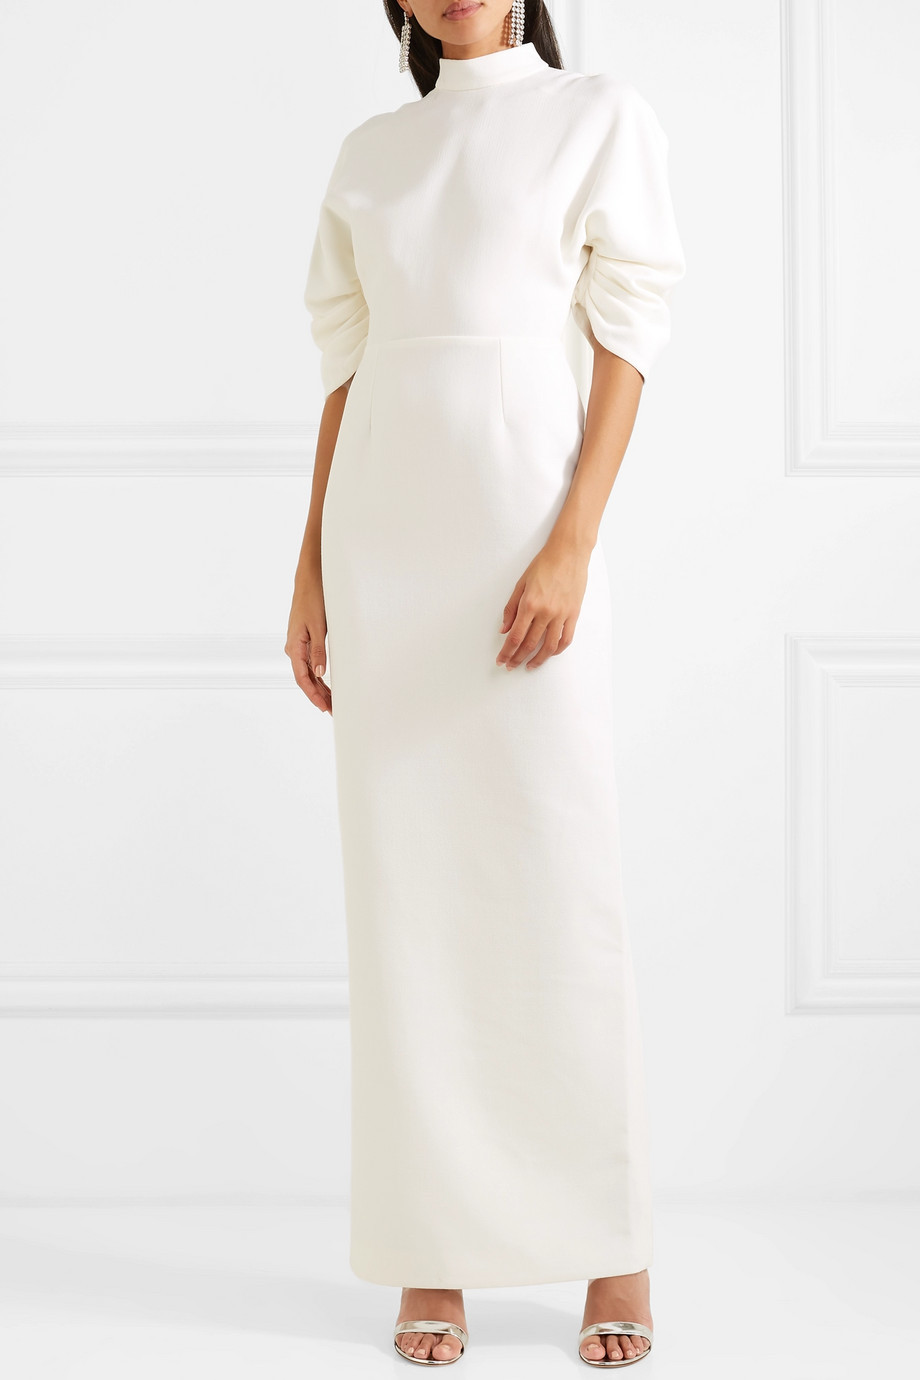 Vestido de mangas abullonadas, de Emilia Wickstead.